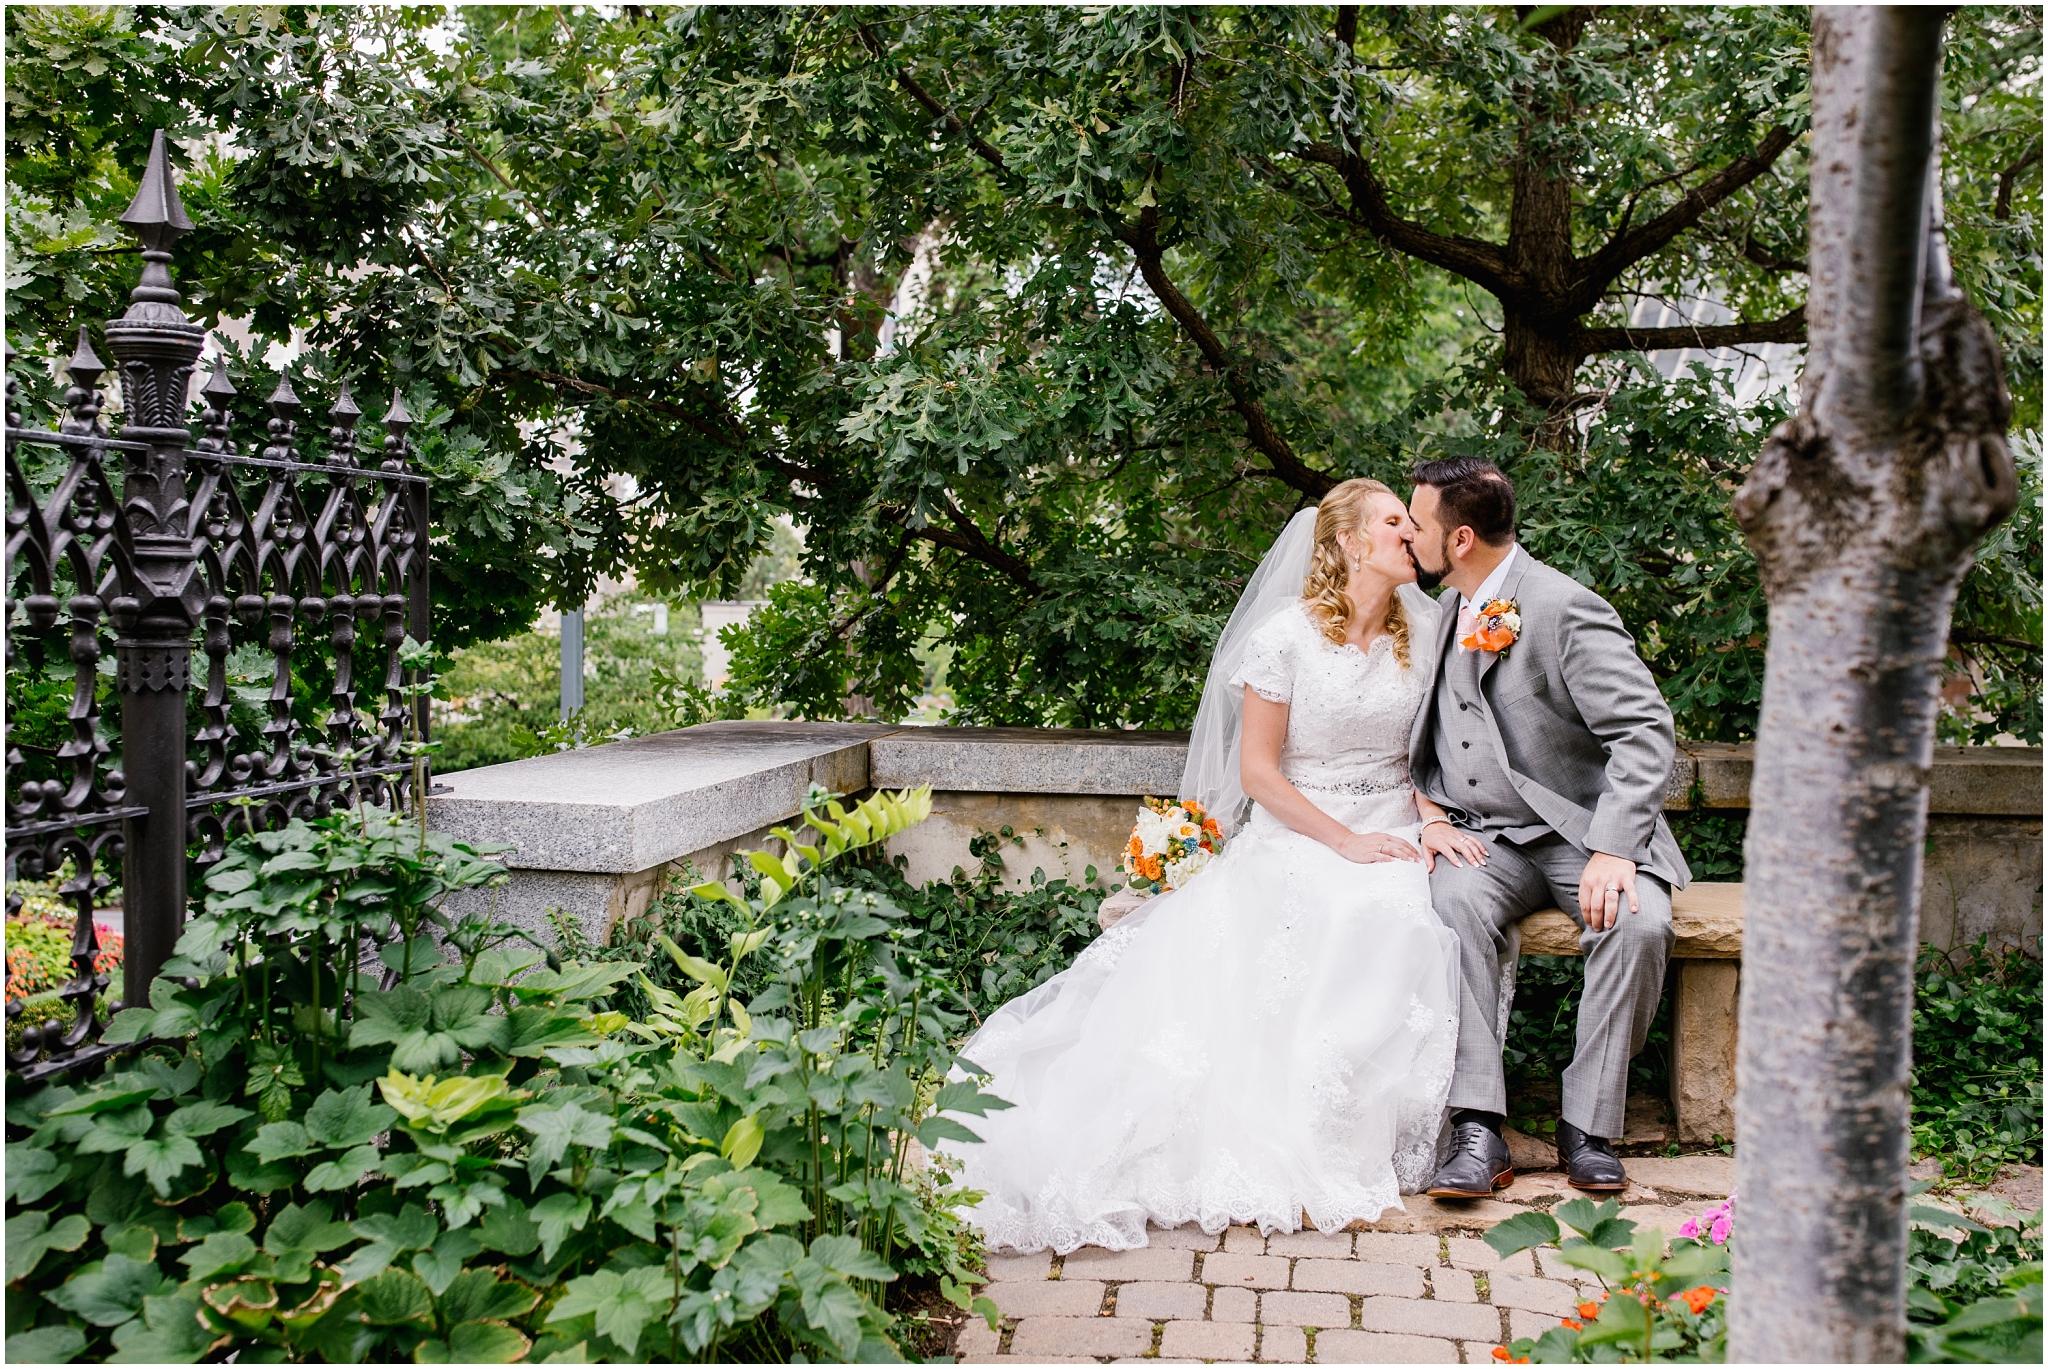 Justin and Melissa-145_Lizzie-B-Imagery-Utah-Wedding-Photographer-Salt-Lake-City-Temple-The-Grand-Ballroom.jpg